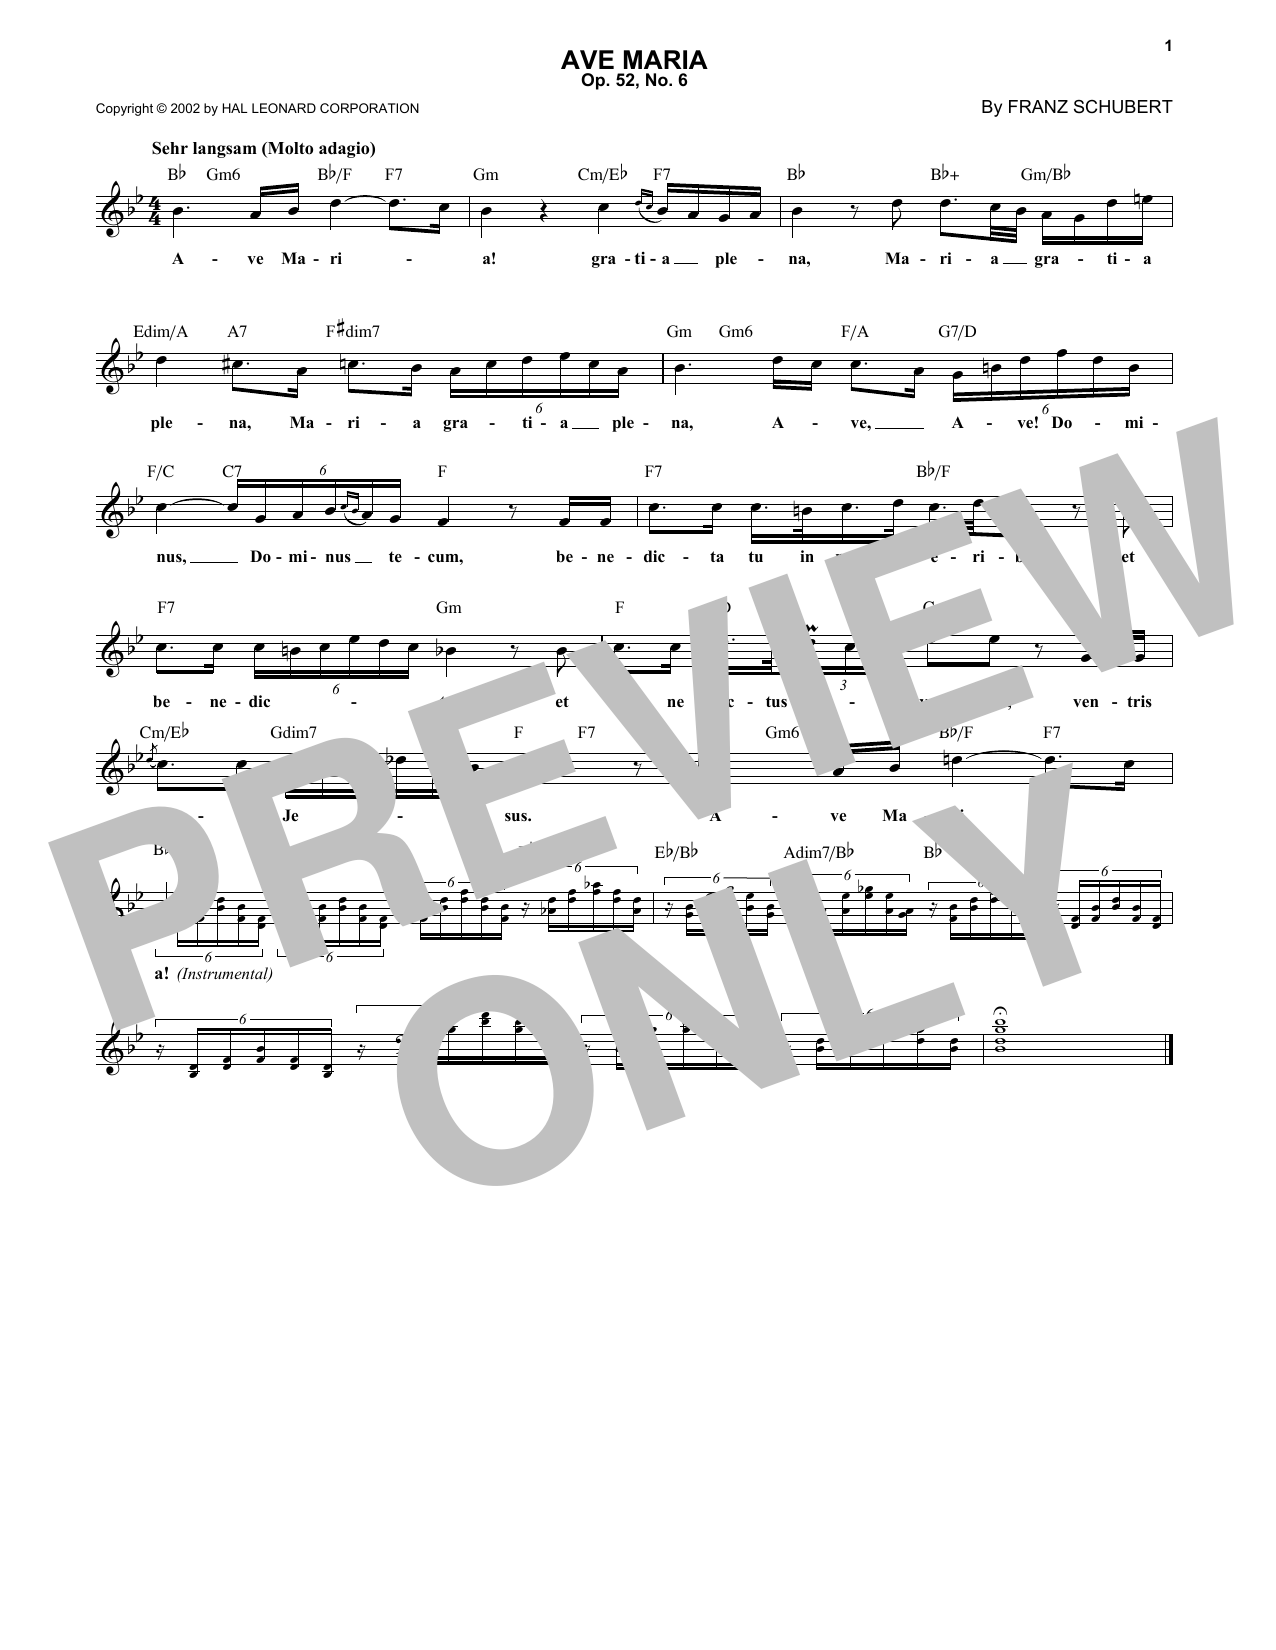 Franz Schubert Ave Maria, Op. 52, No. 6 sheet music notes and chords